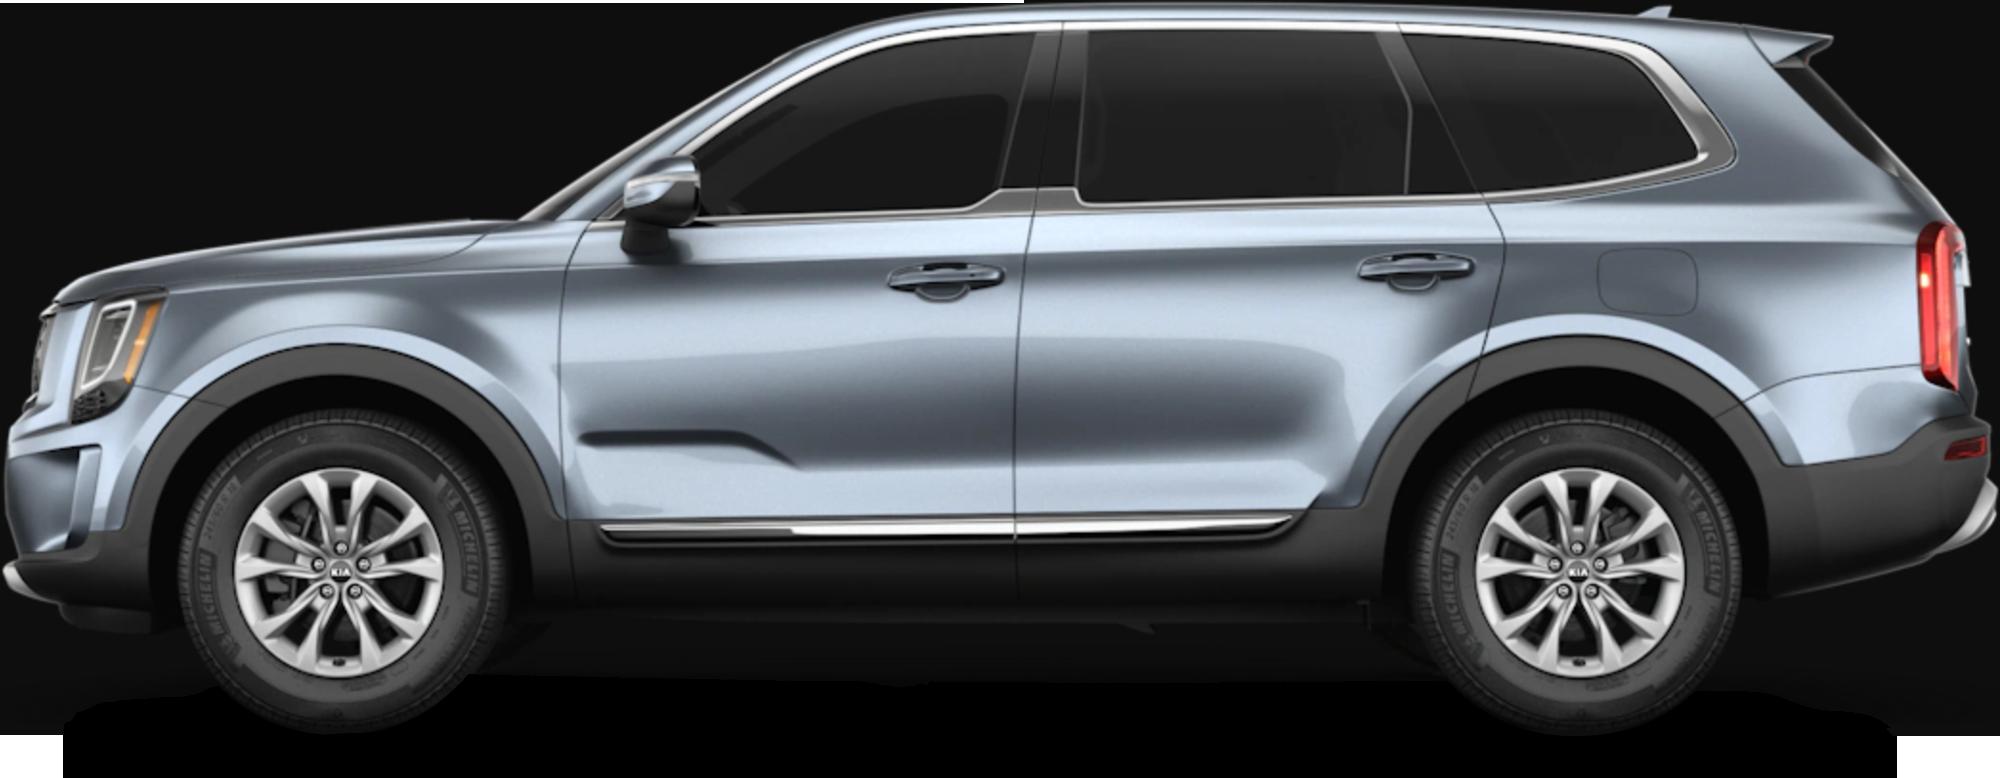 2021 Kia Telluride SUV LX